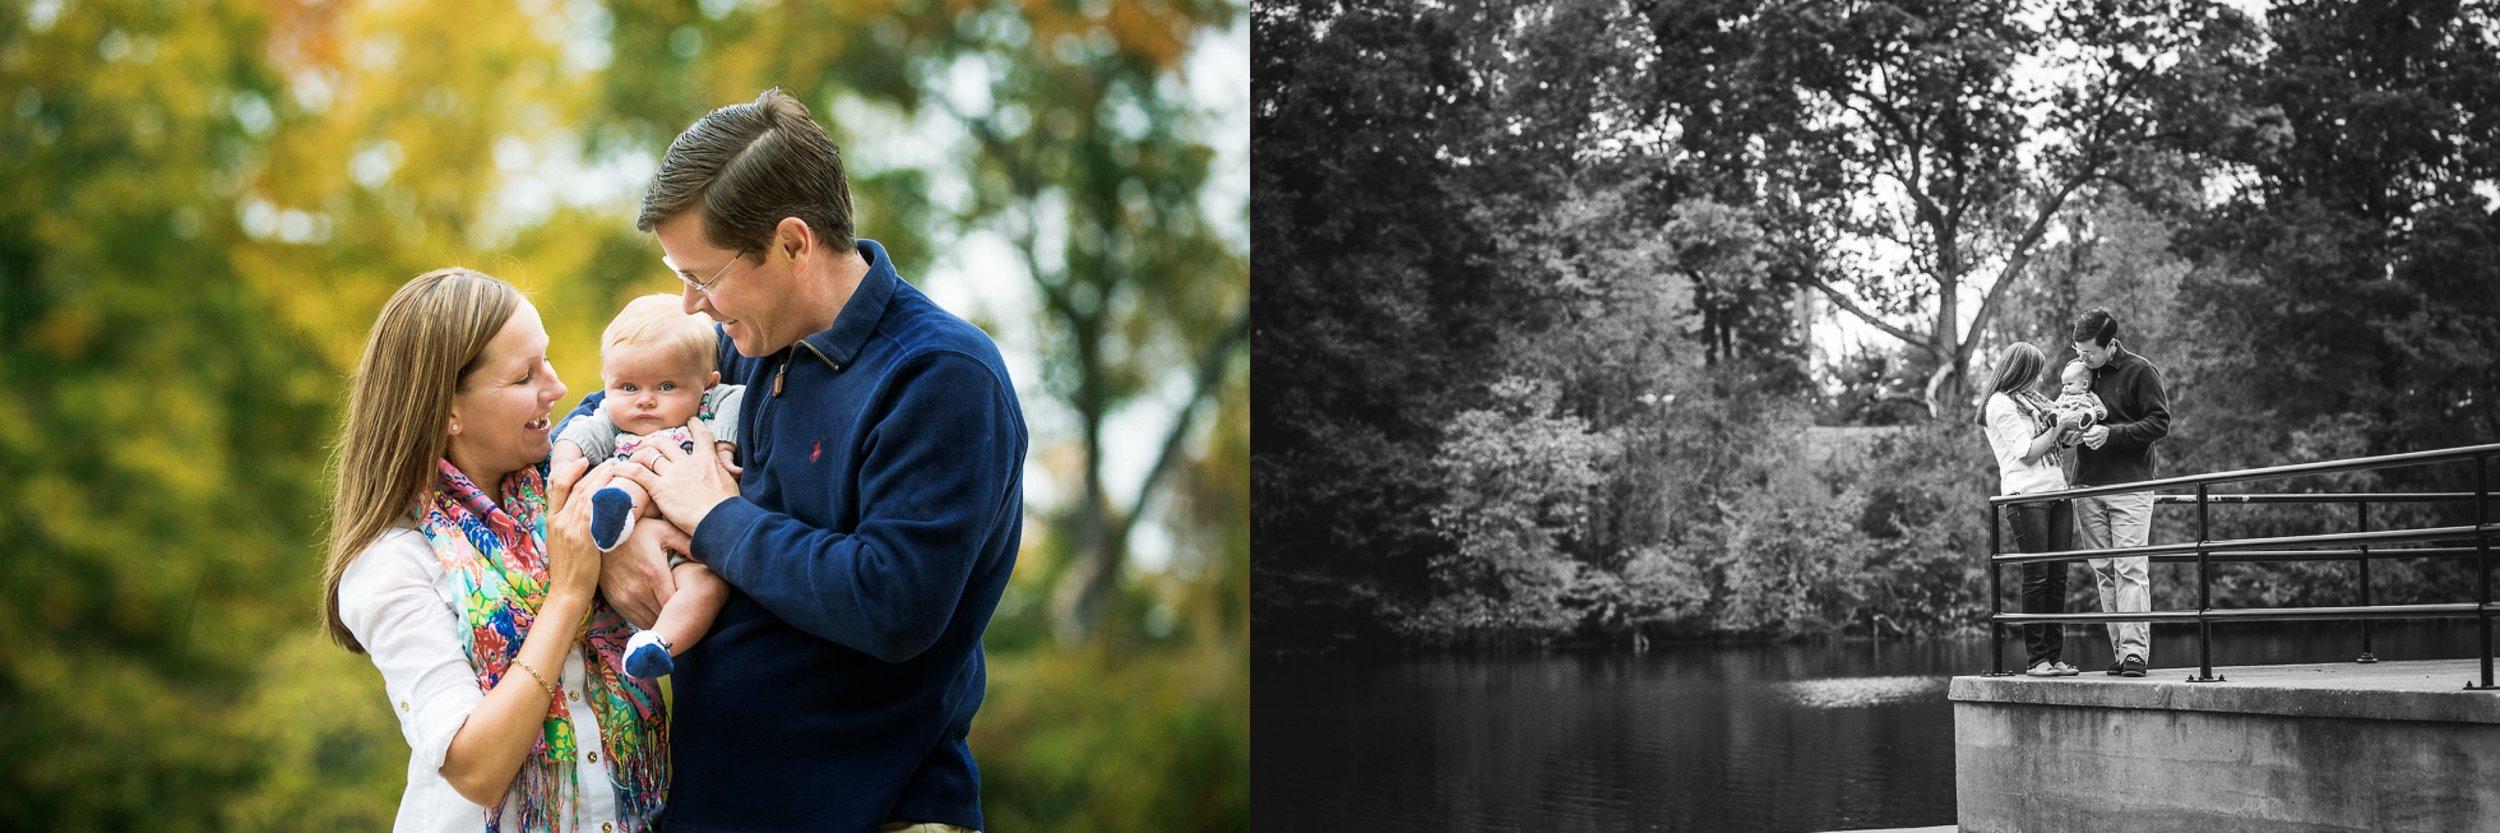 2015,Gwenyth,Porter Family,fall foliage,family,porter blog,robert e lee park,